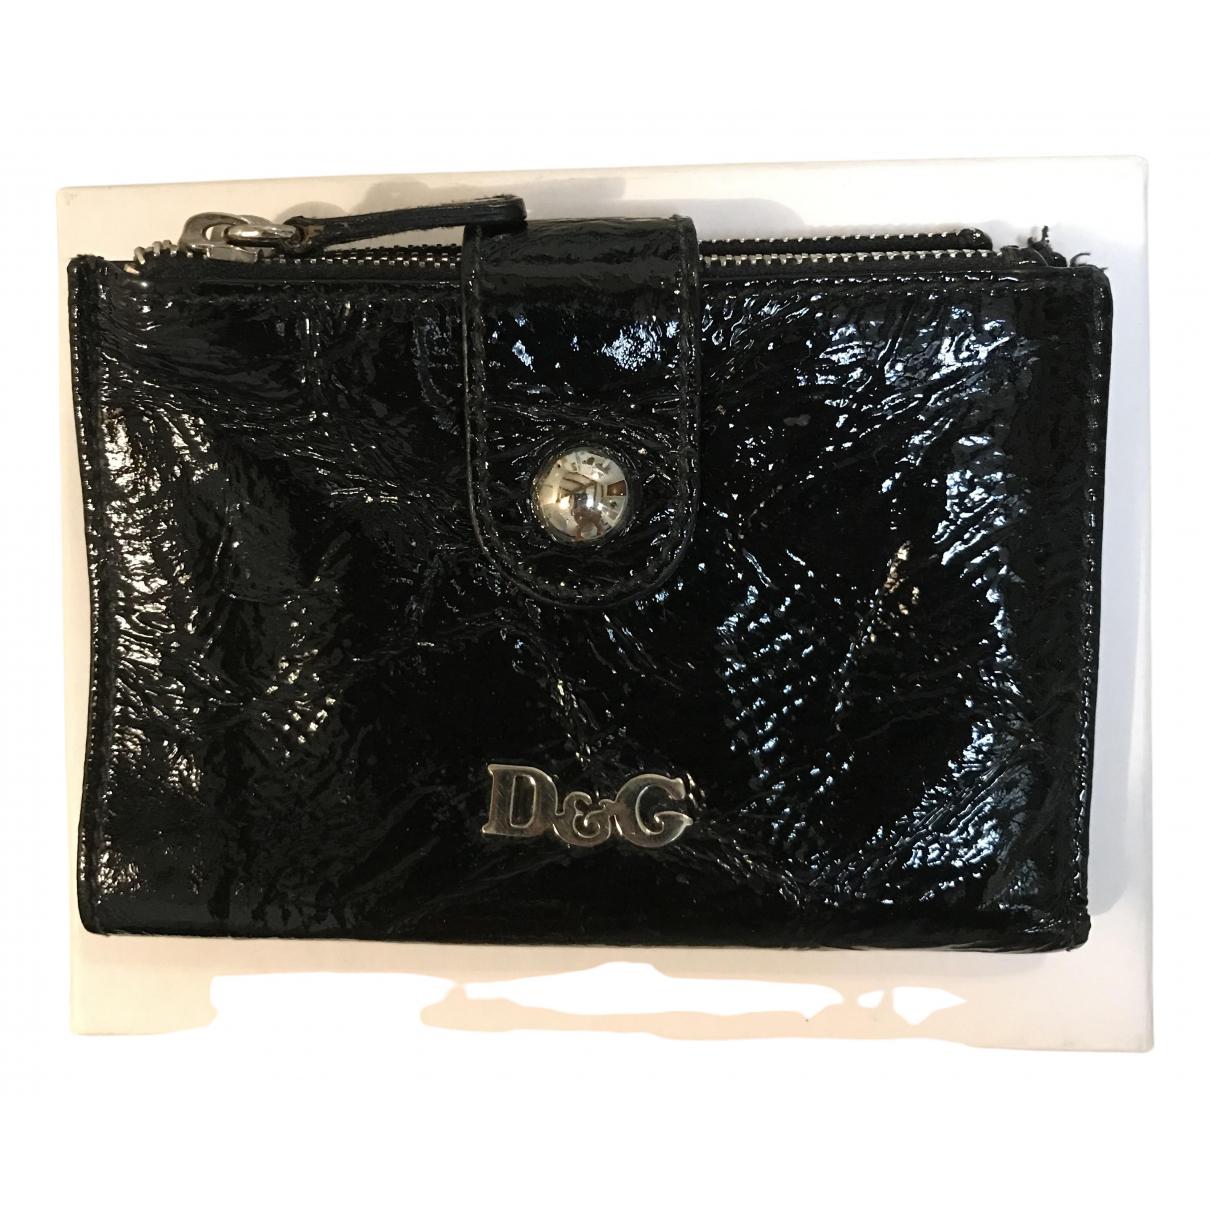 D&g \N Portemonnaie in  Schwarz Lackleder